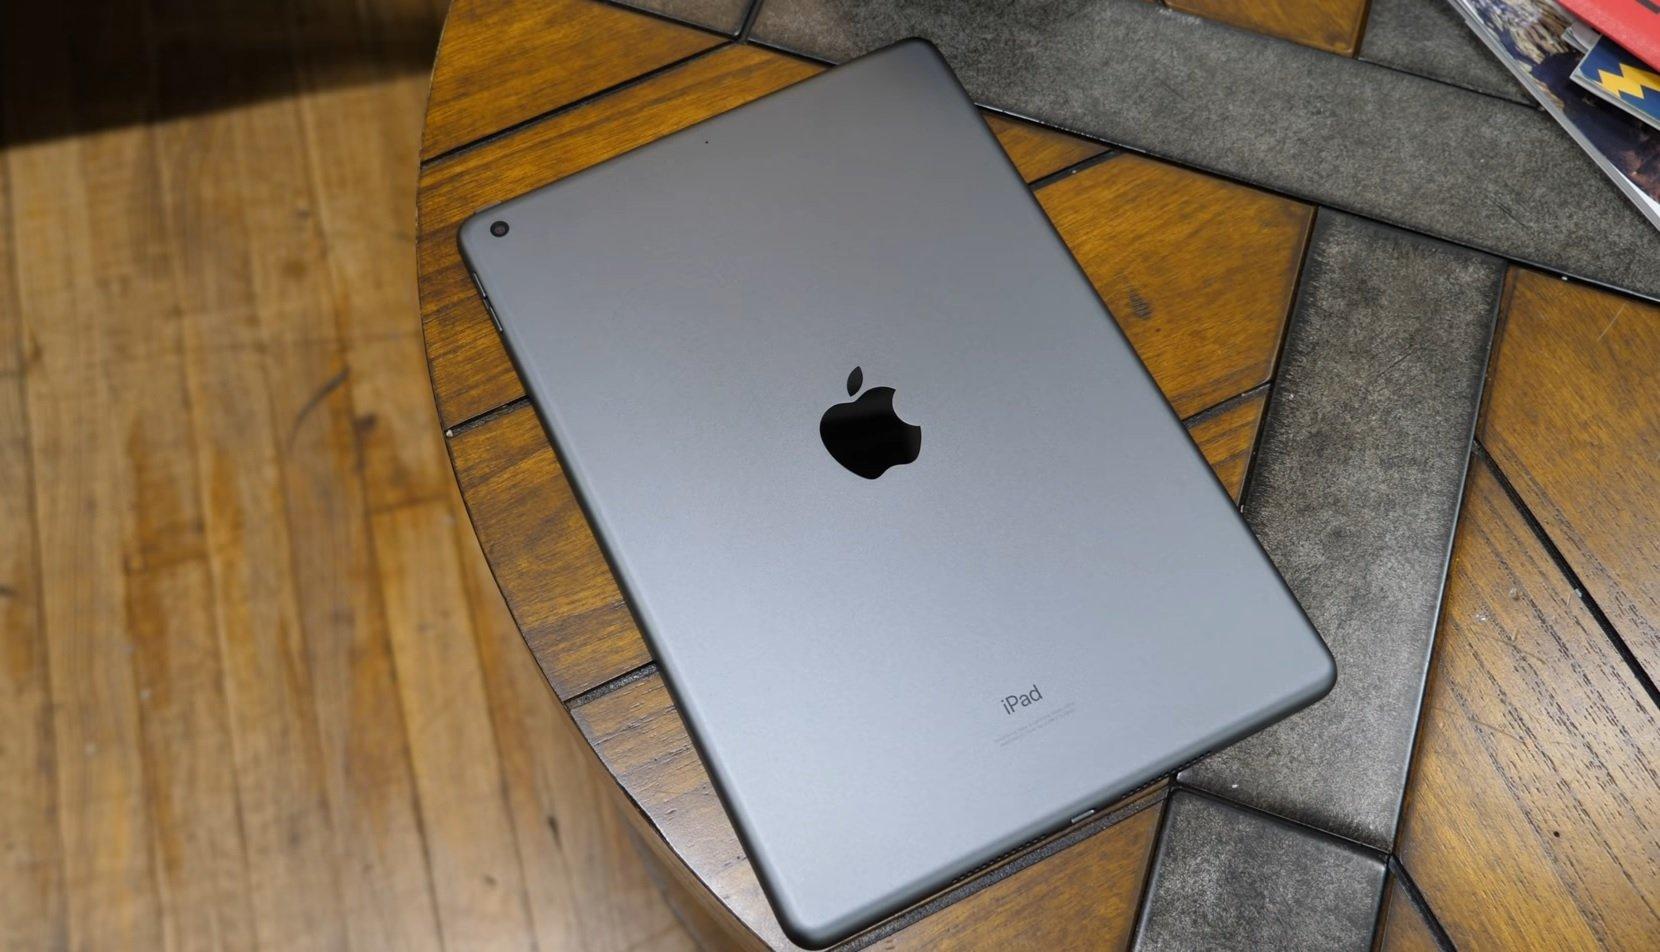 10.2-inch iPad on wooden desk, video screenshot